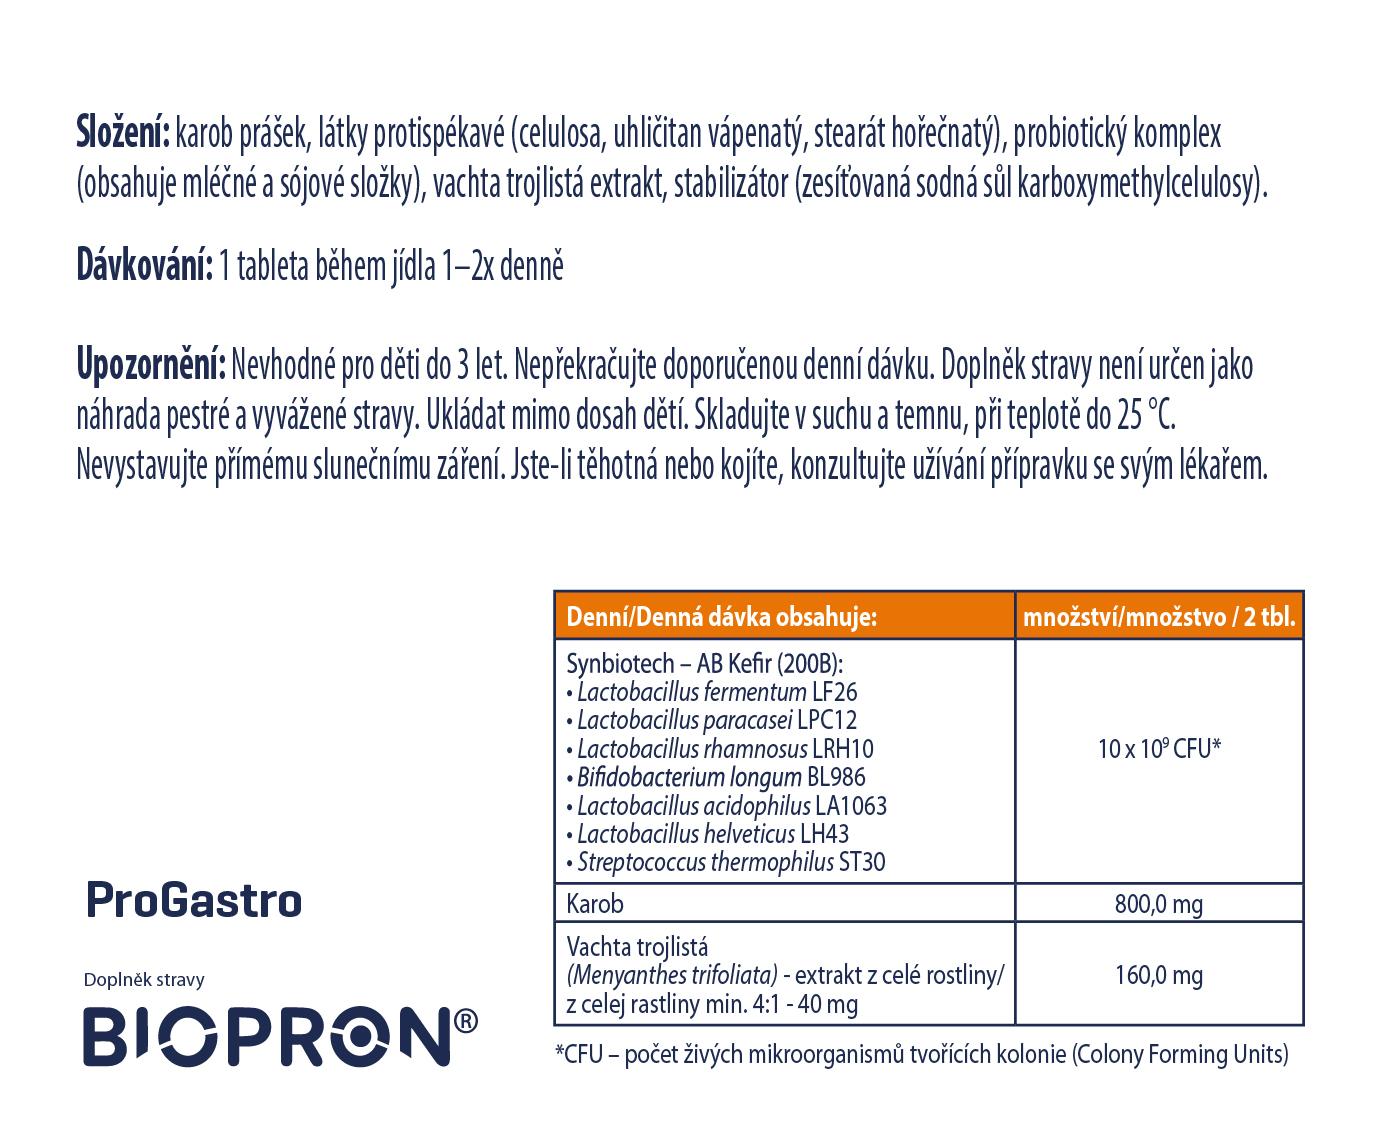 Biopron ProGastro